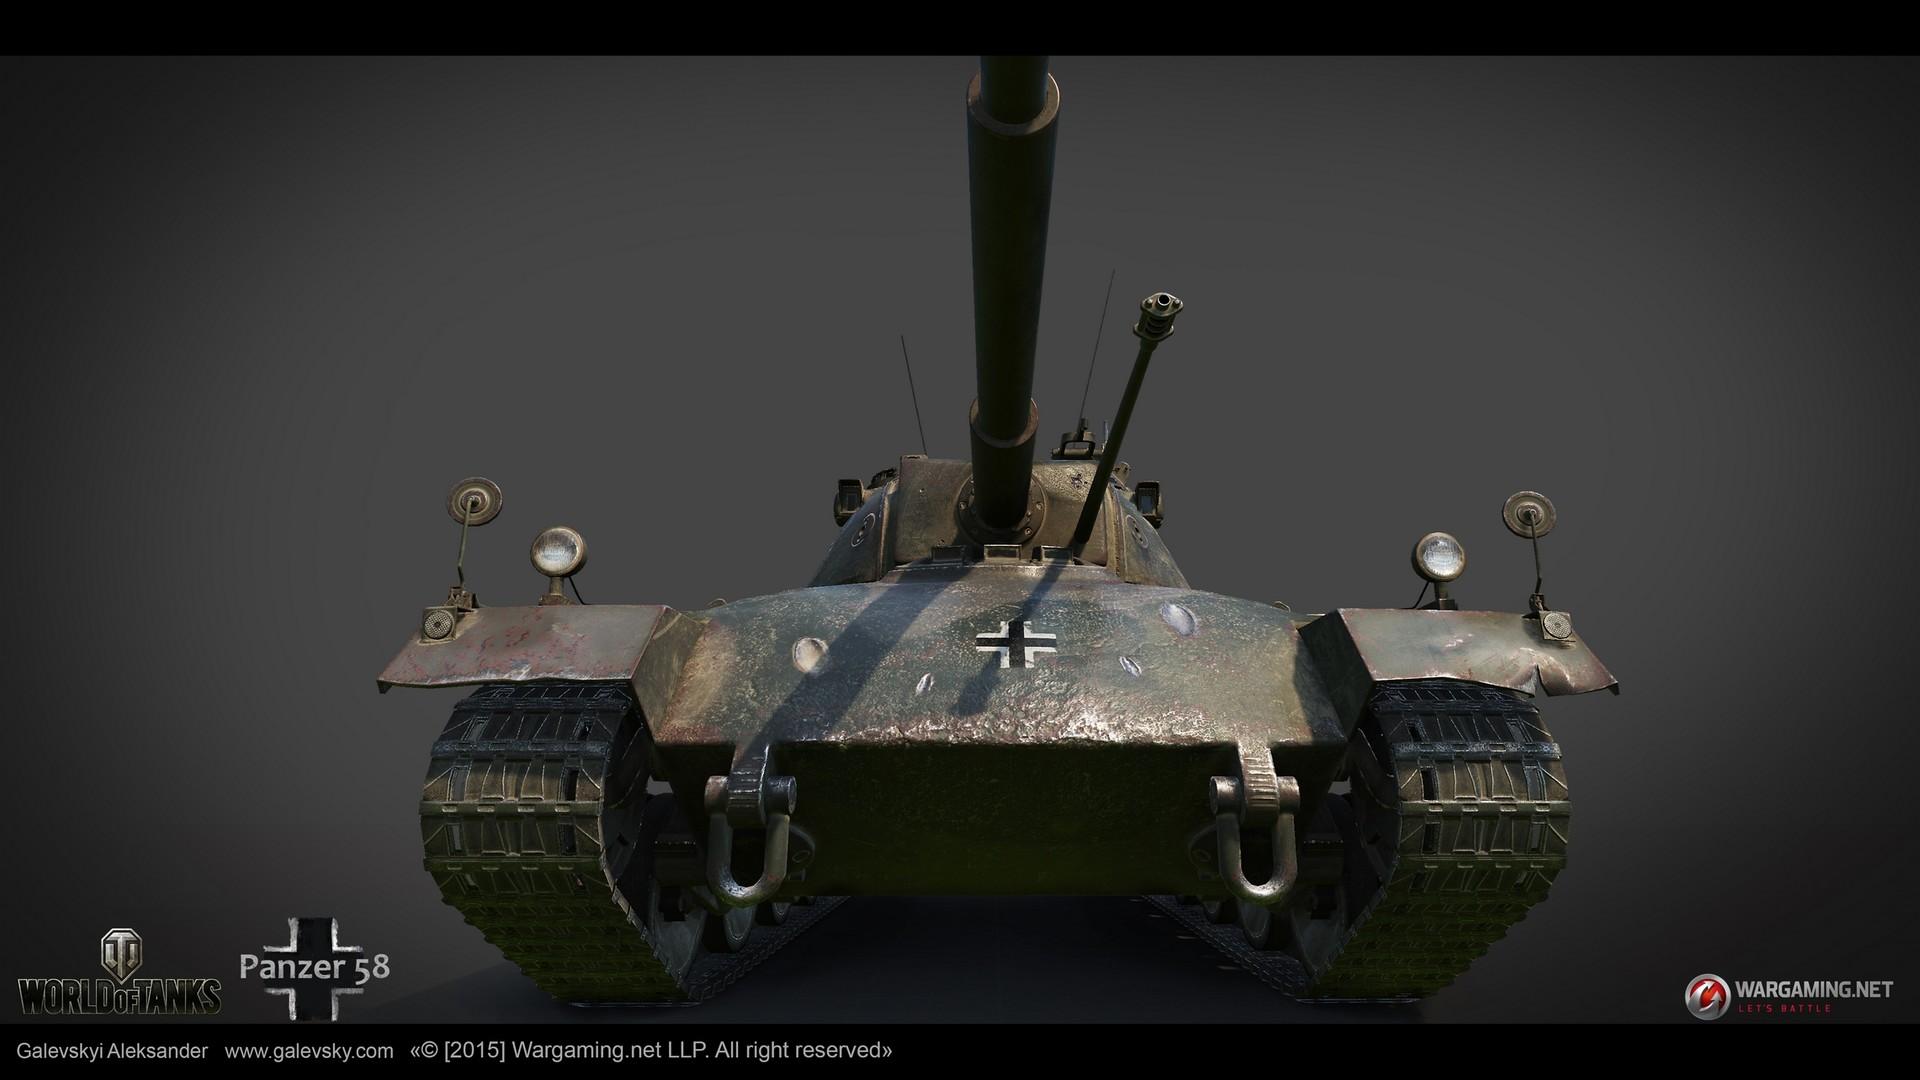 Aleksander galevskyi panzer 58 03 med